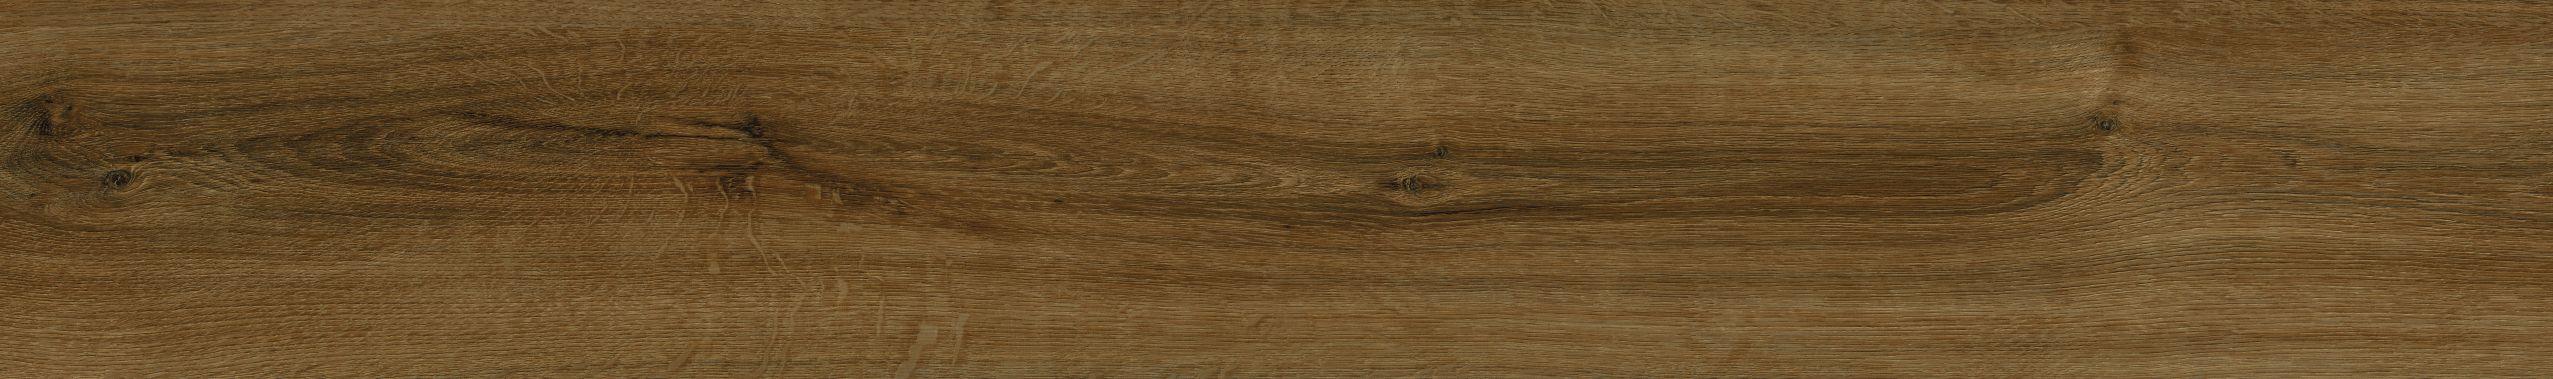 Panele winylowe LVT modulari ® WOOD DRYBACK 19,6 x 132 cm 24867